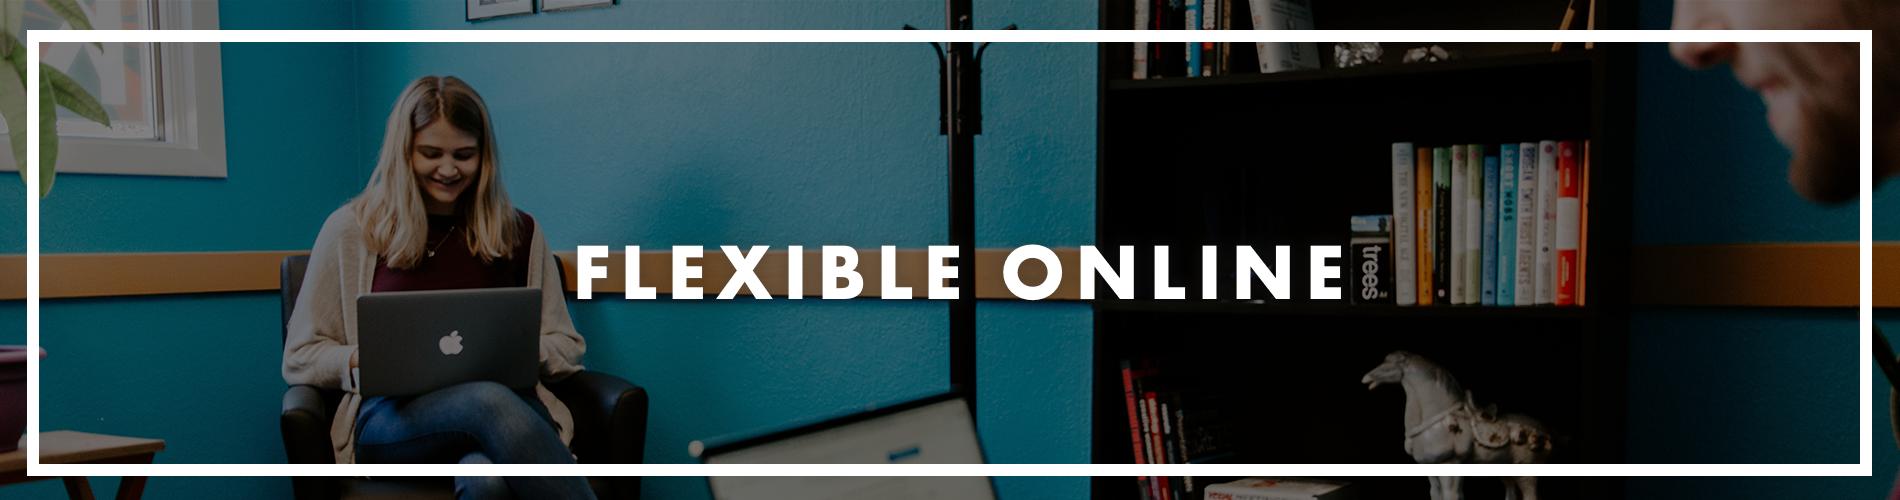 Flexible Online Banner